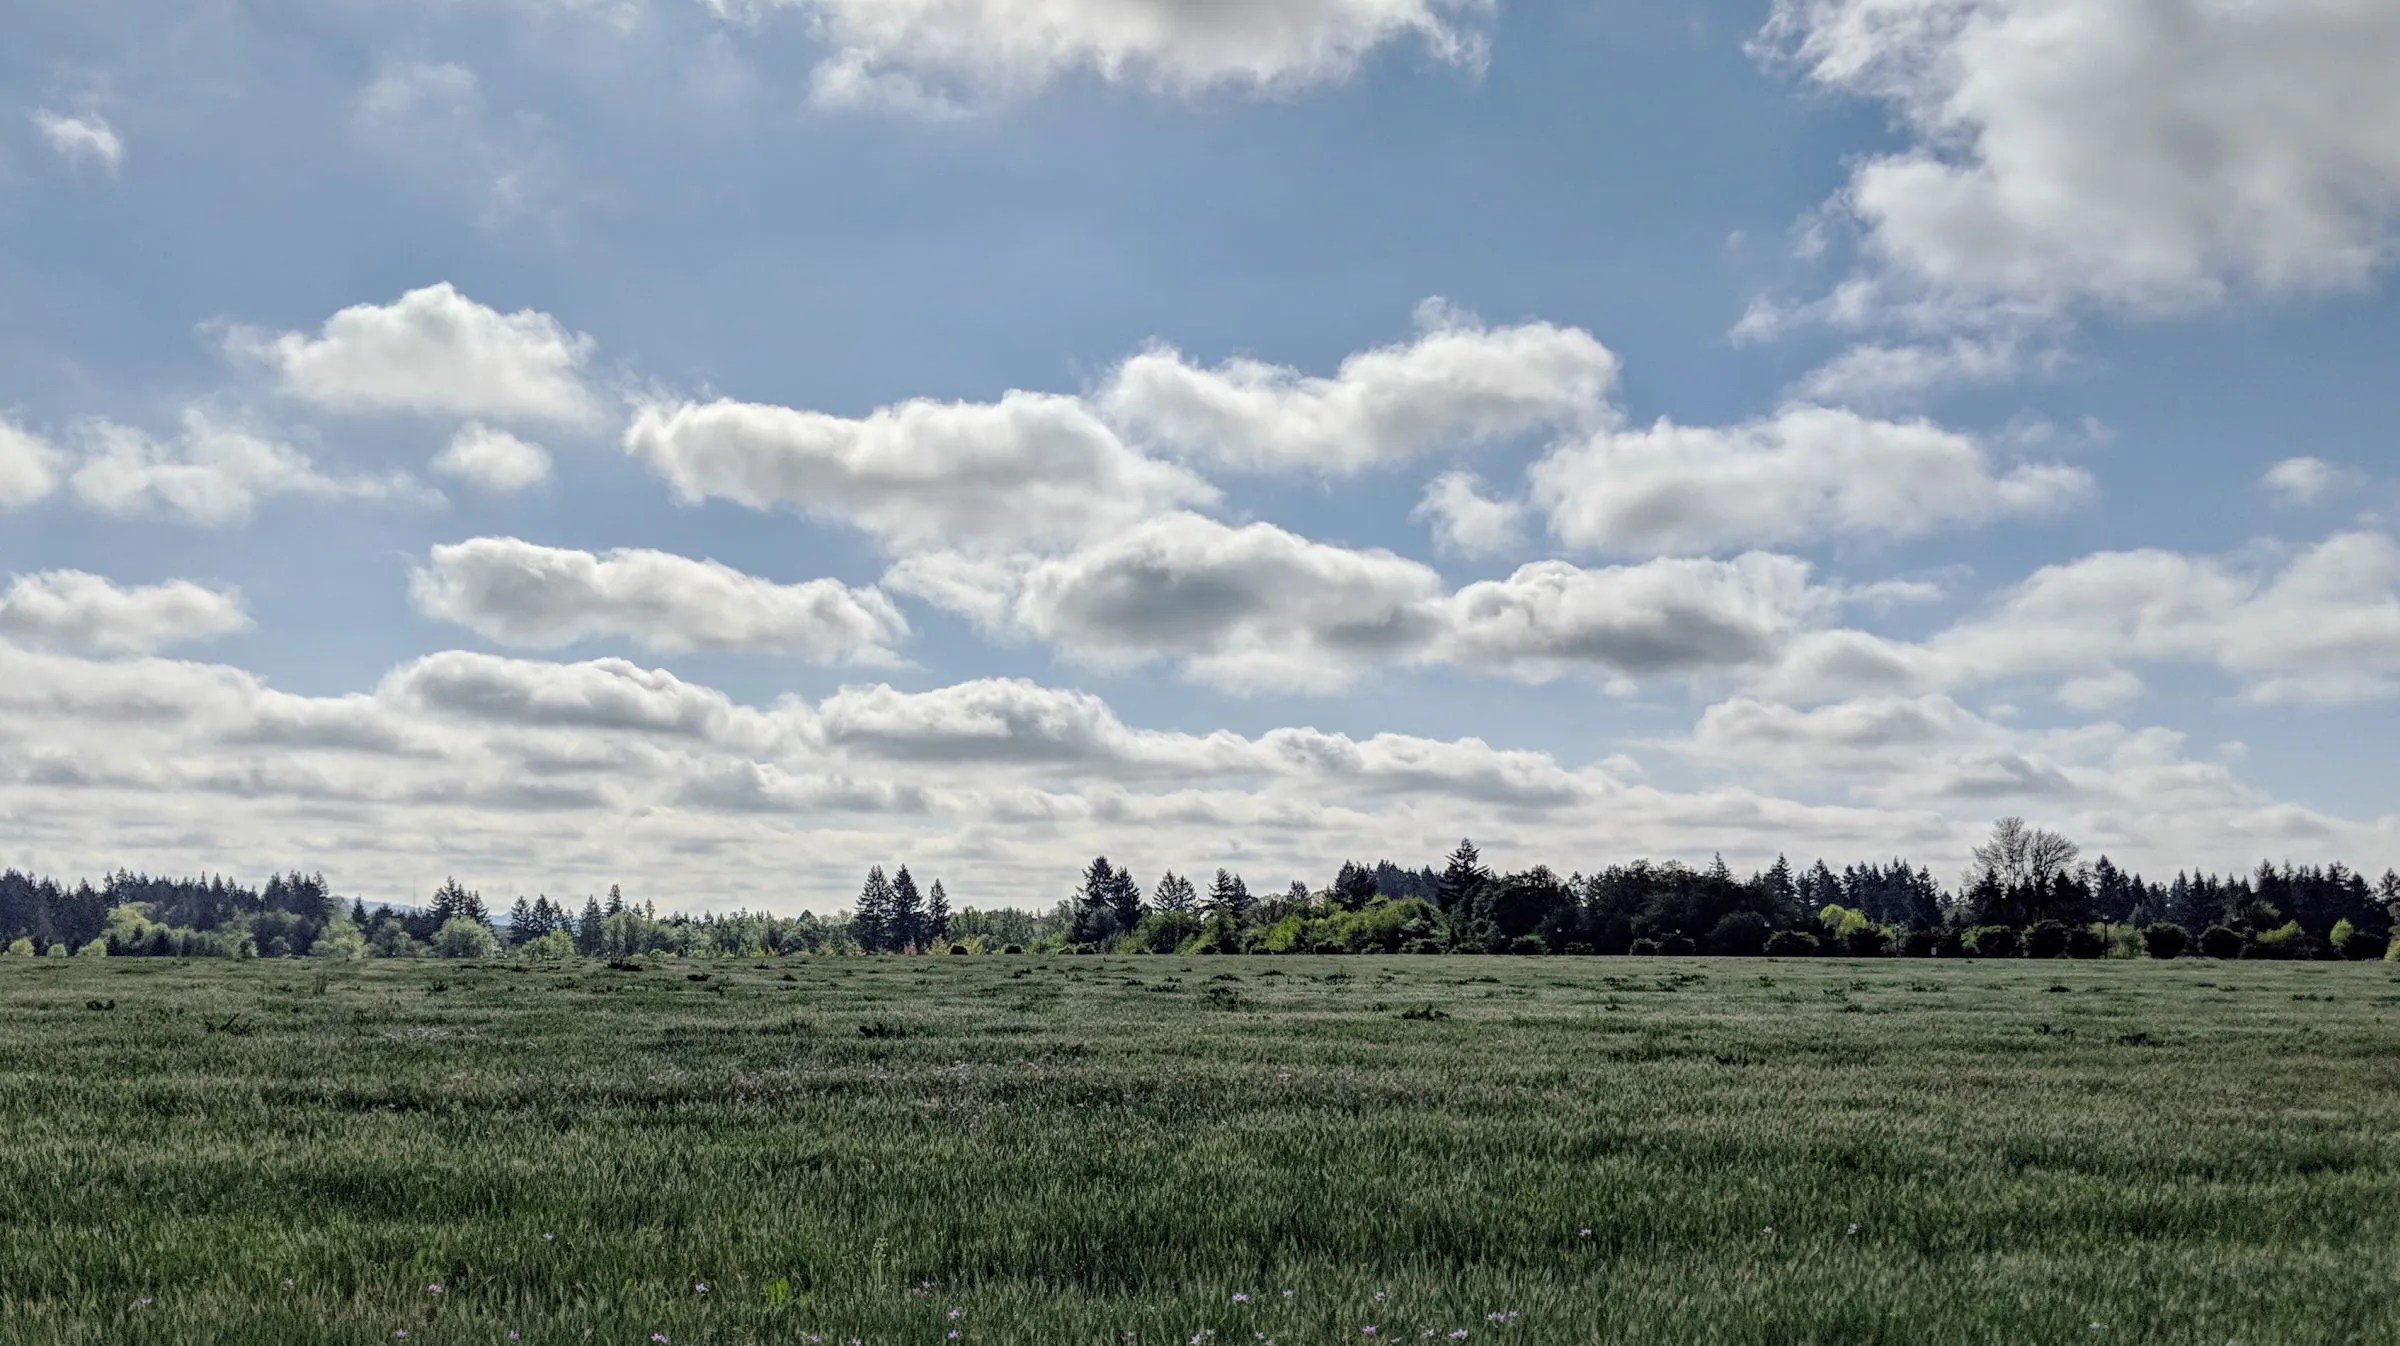 Photo spot across from the Hillsboro airport